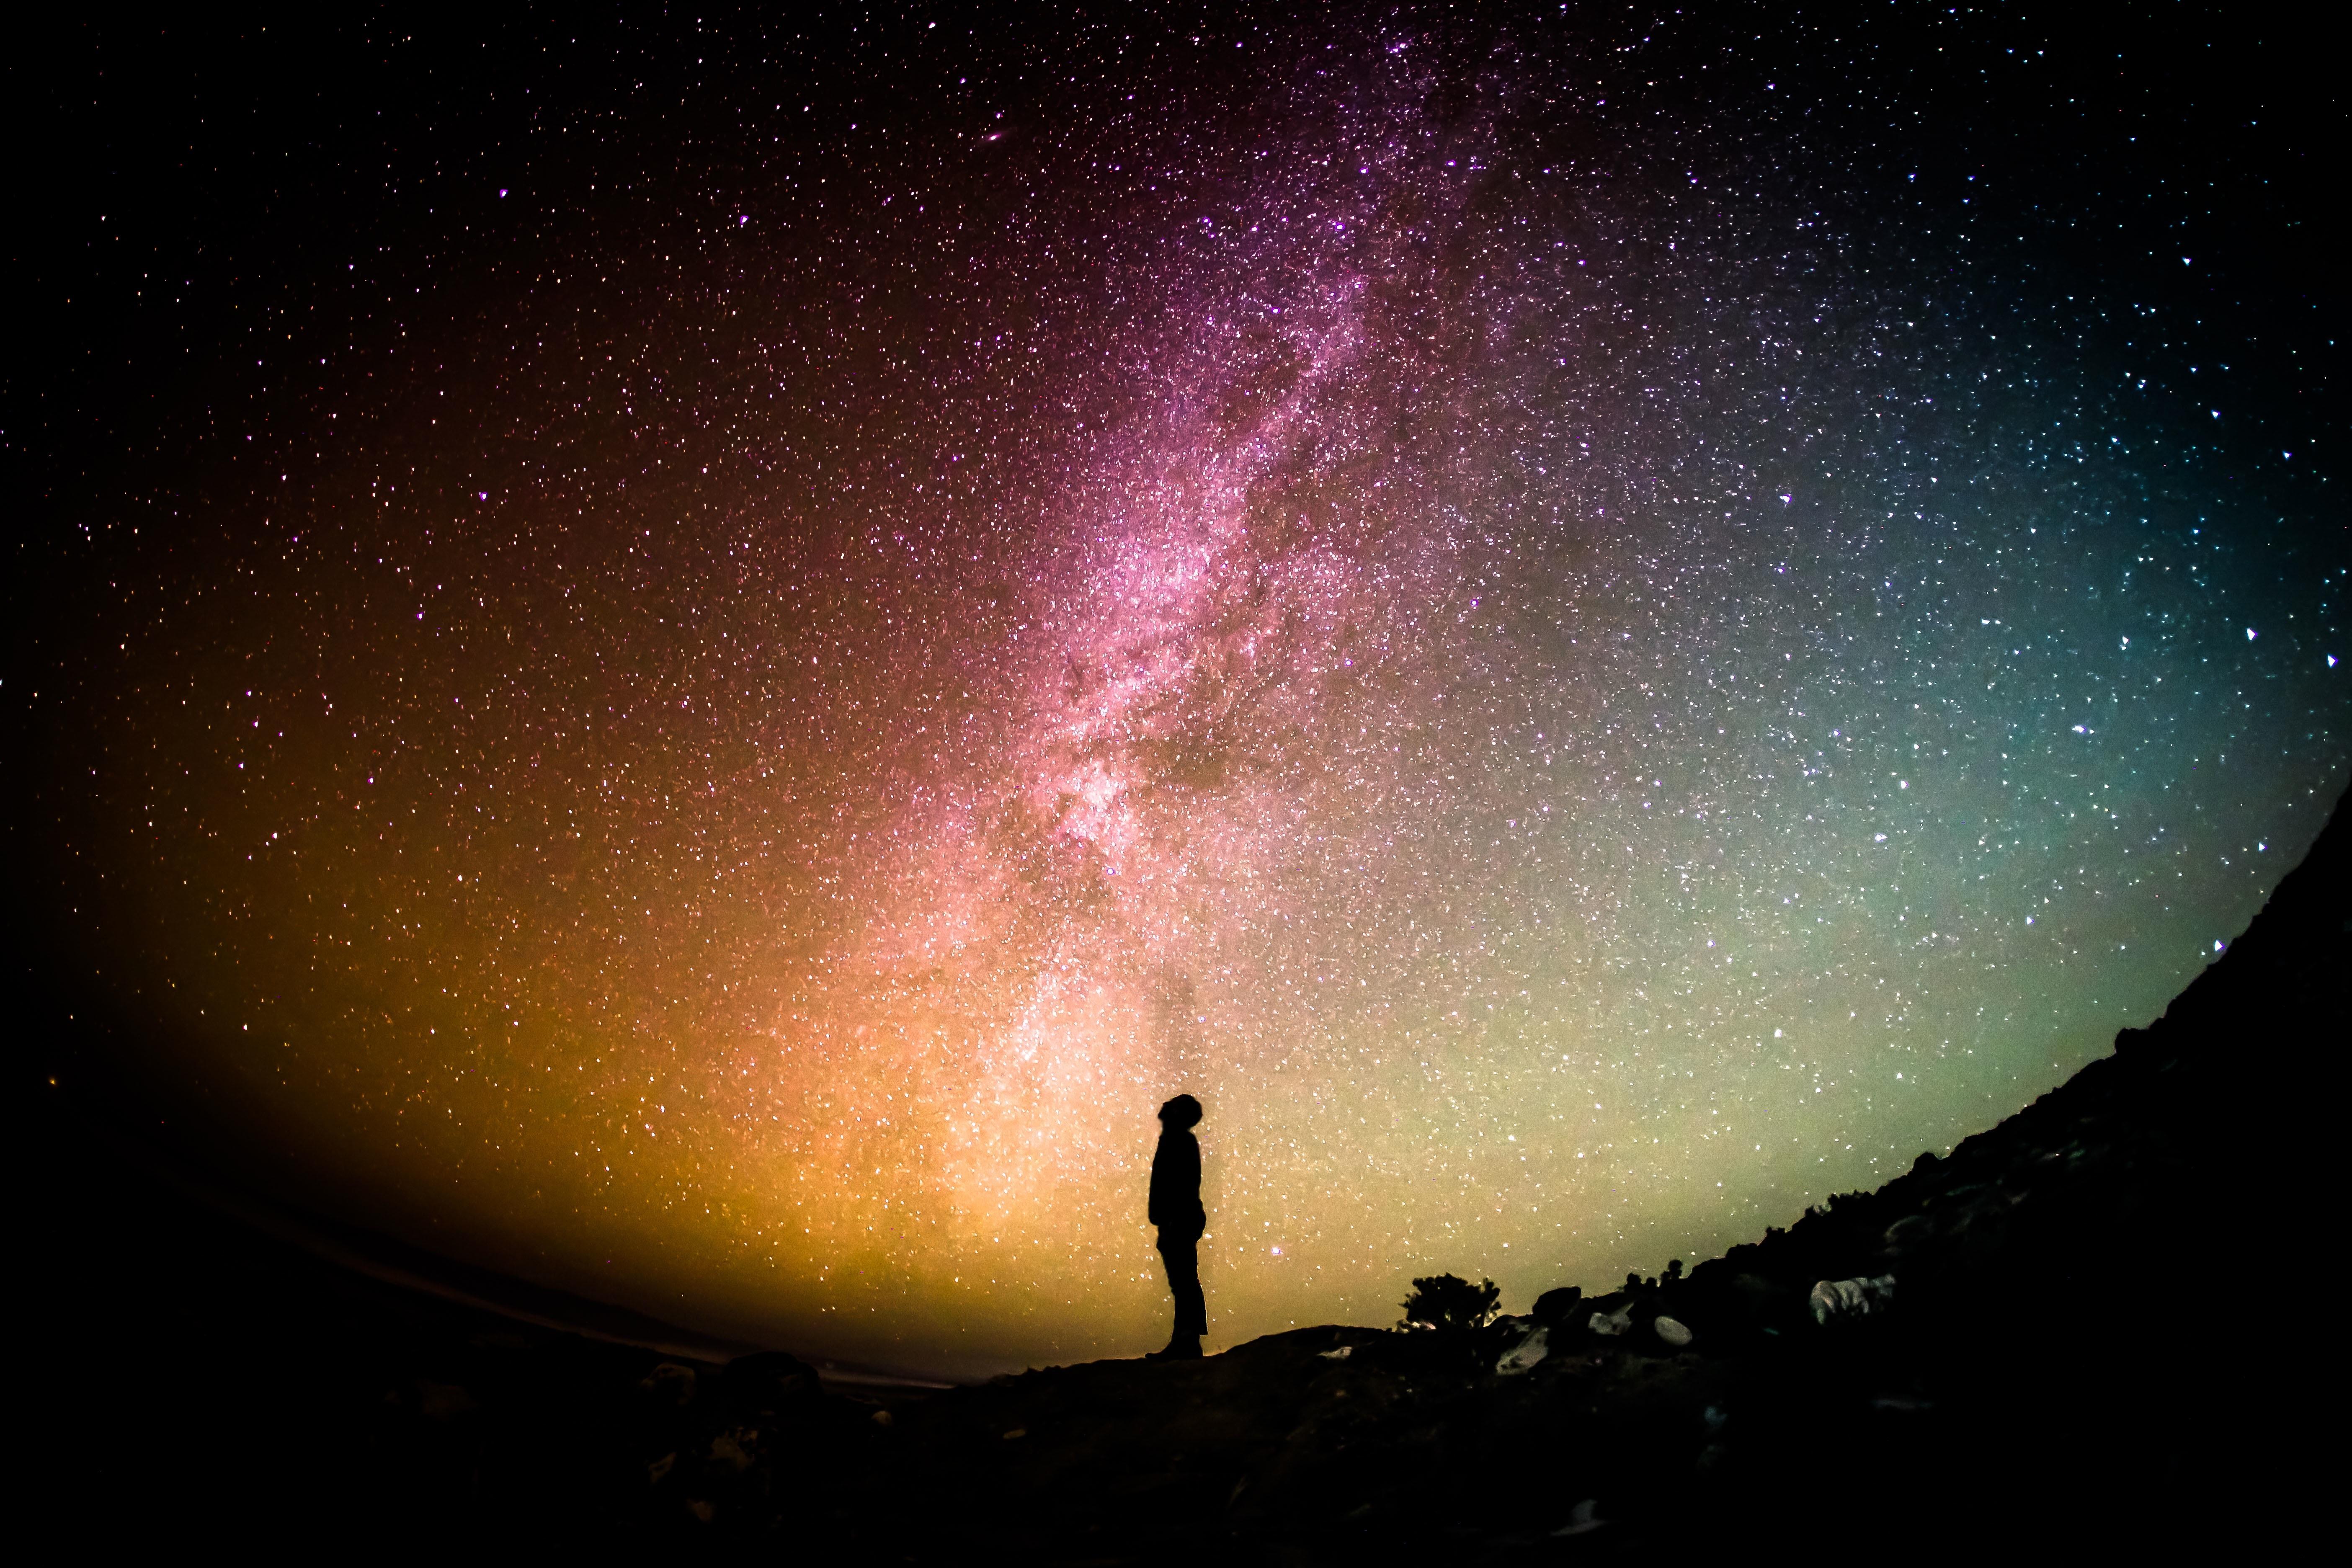 A starfield